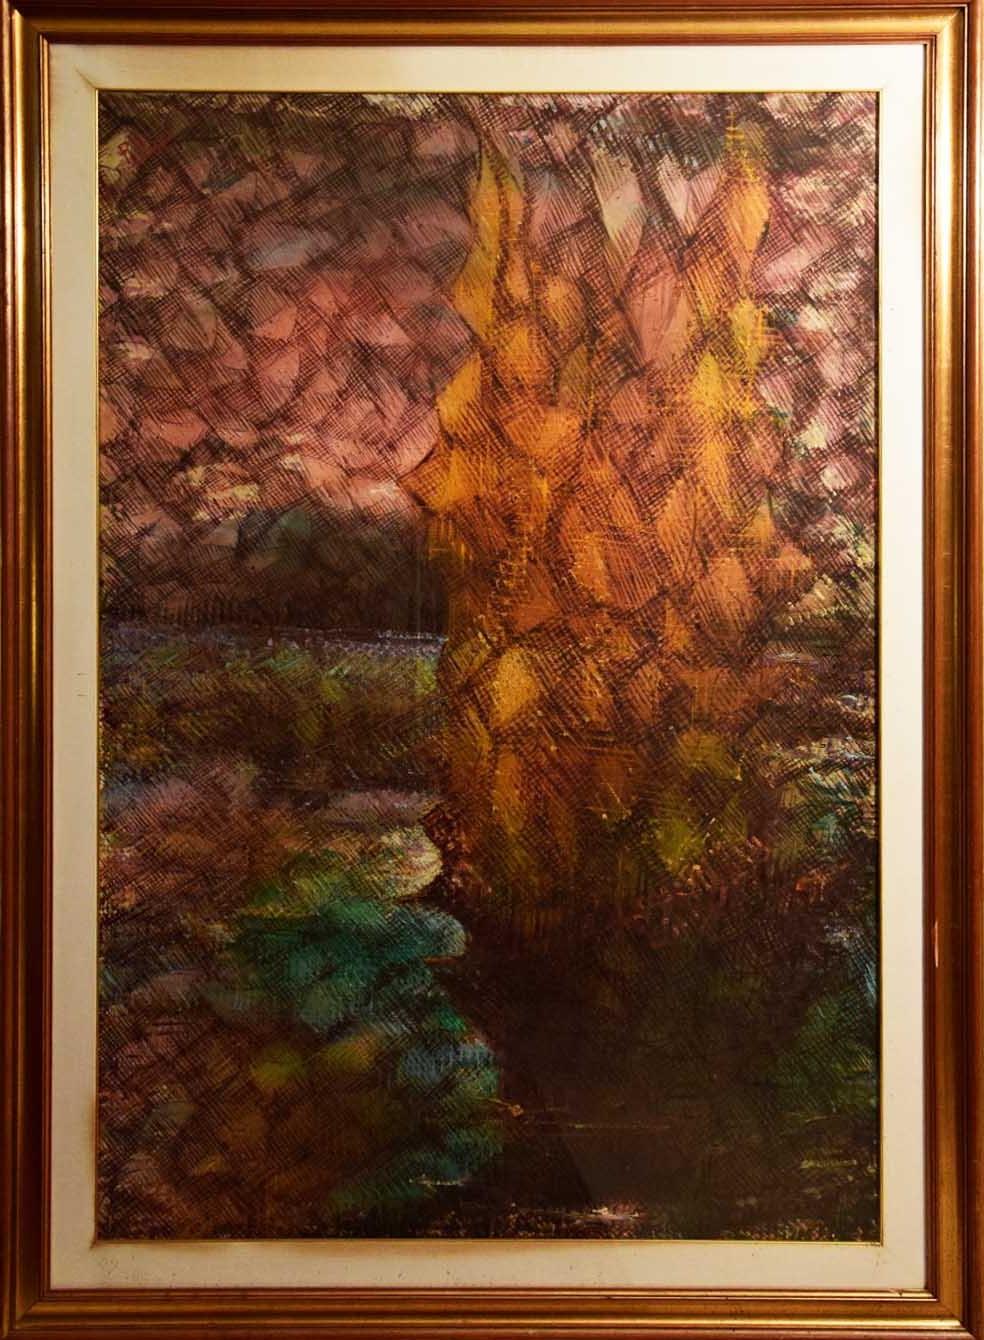 Pasquale Pilla – Vela all'imbrunire